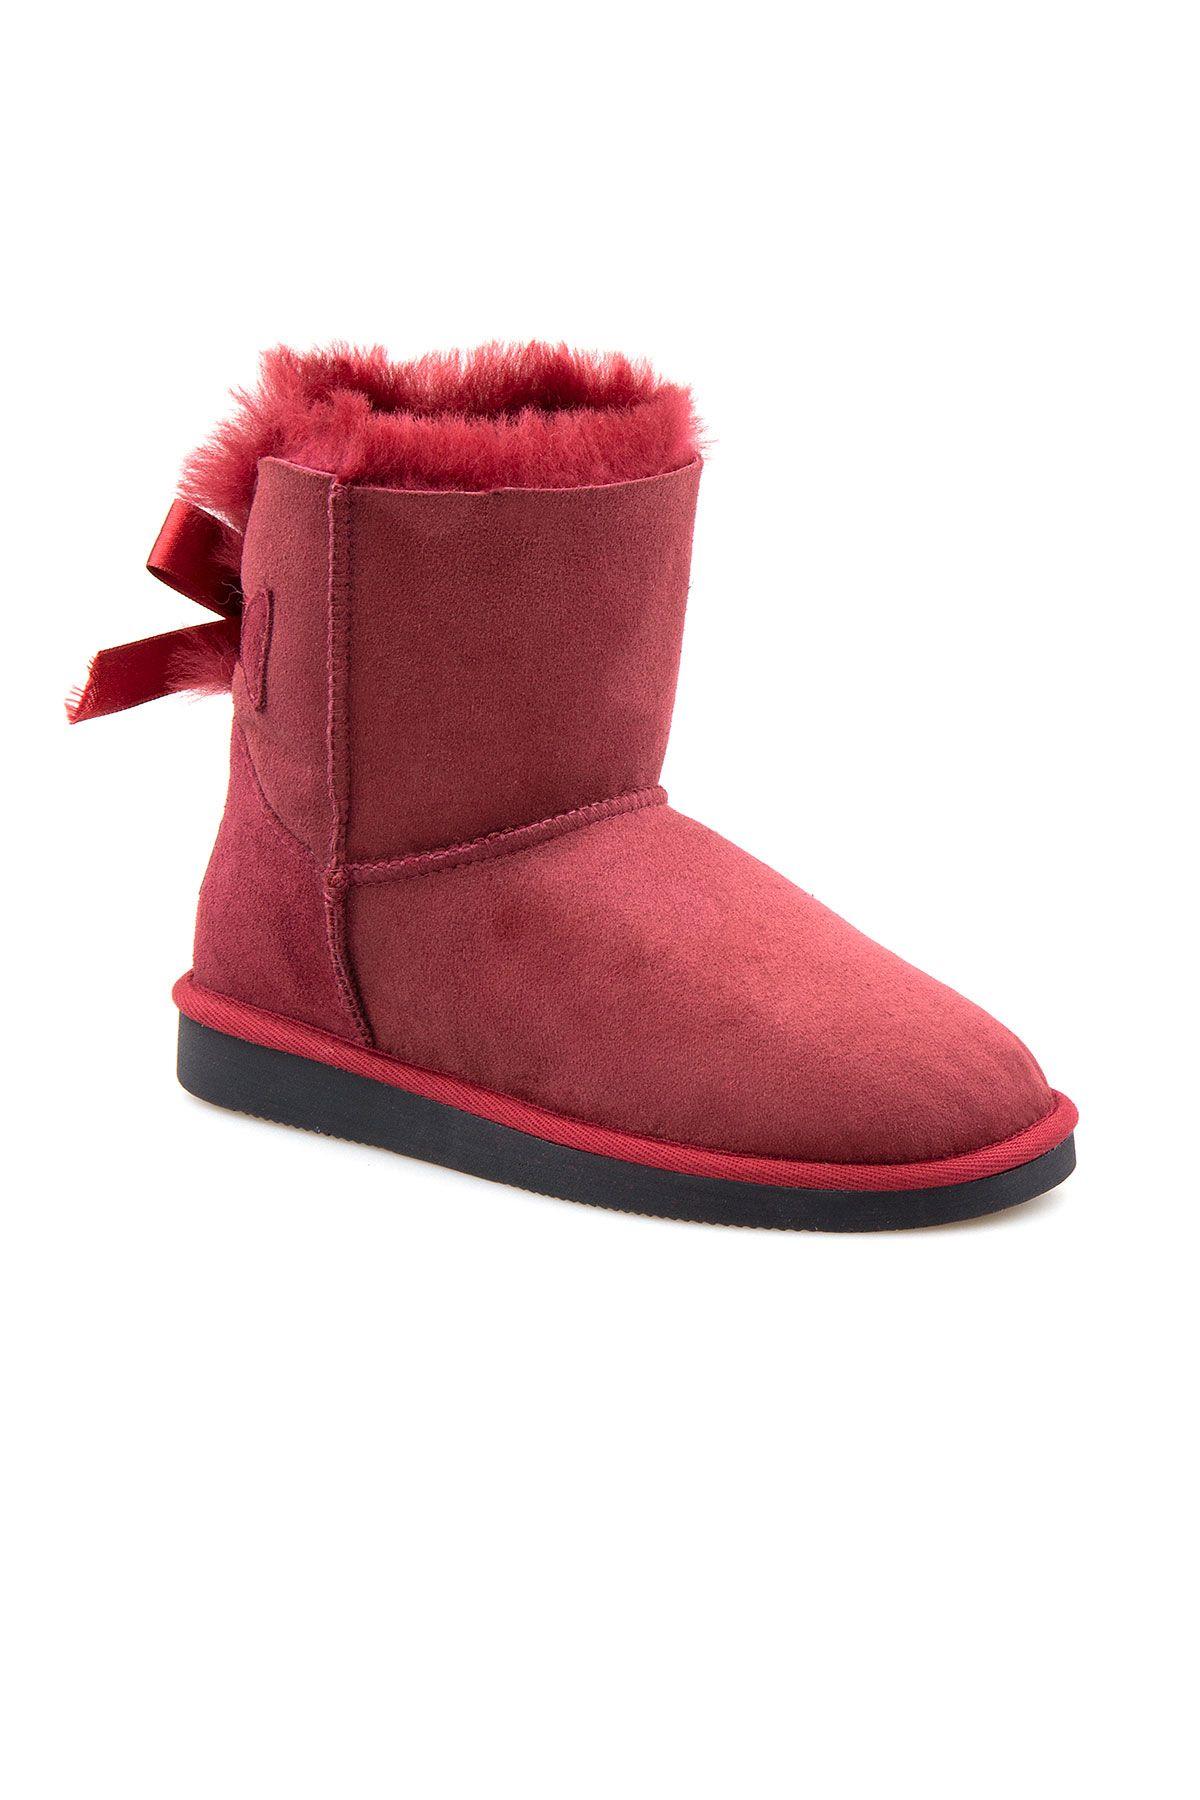 Pegia Genuine Sheepskin Women's Boots 191061 Claret red